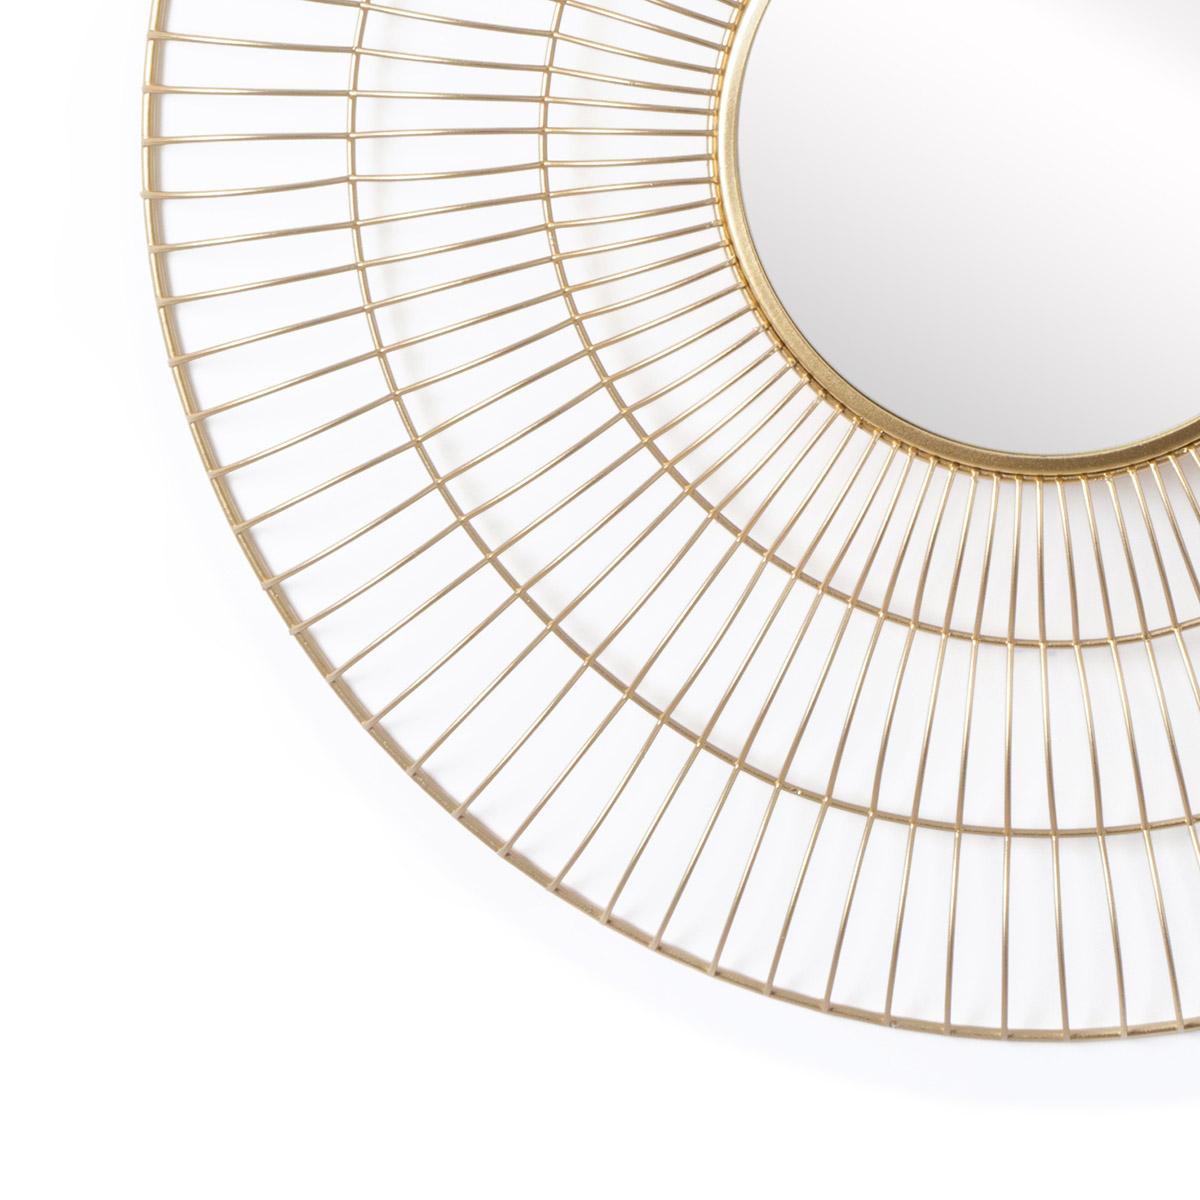 spejo de pared decorativo redondo Ring, metálico, rayas, estilo étnico & boho chic, nórdico, bonito